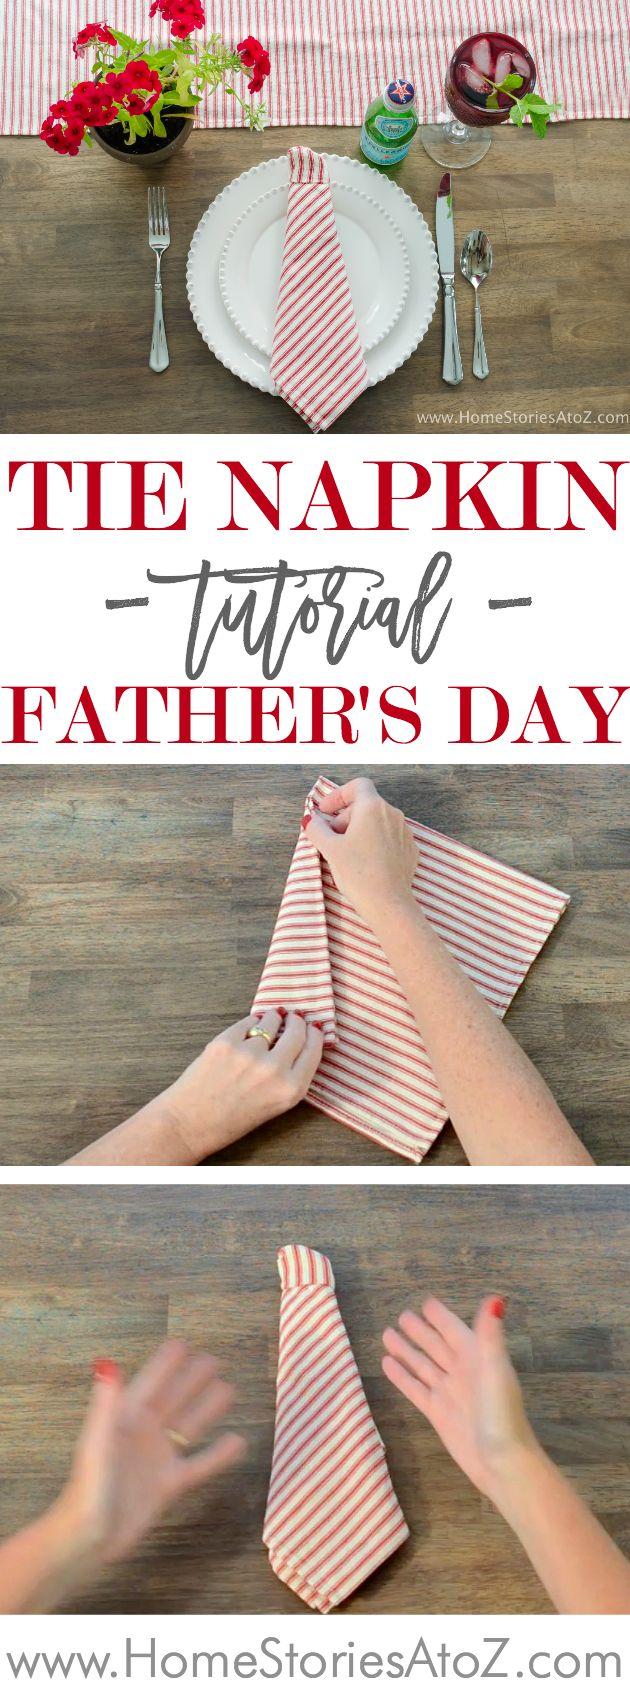 Father's Day Table Setting Idea: Napkin Tie Tutorial